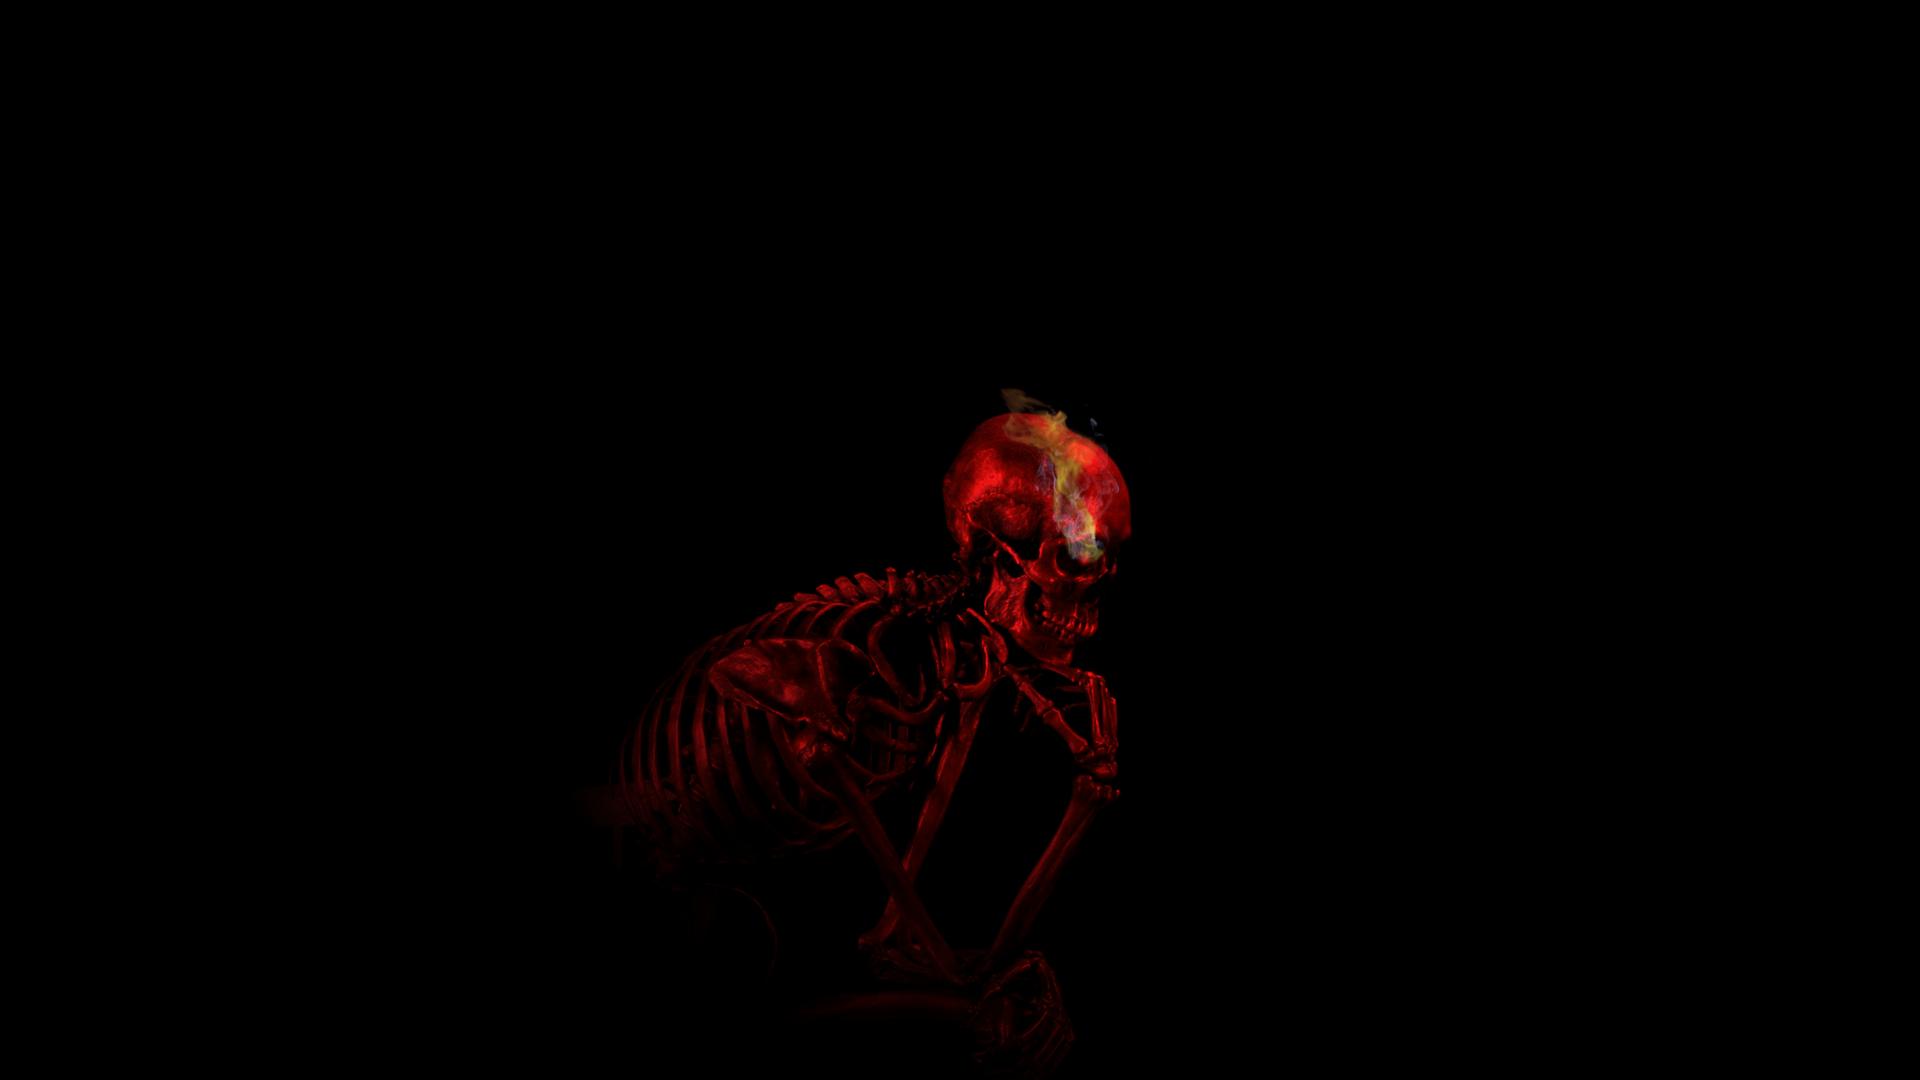 General 1920x1080 digital art skull black background minimalism red skeleton smoke thinking bones ribs teeth imagination